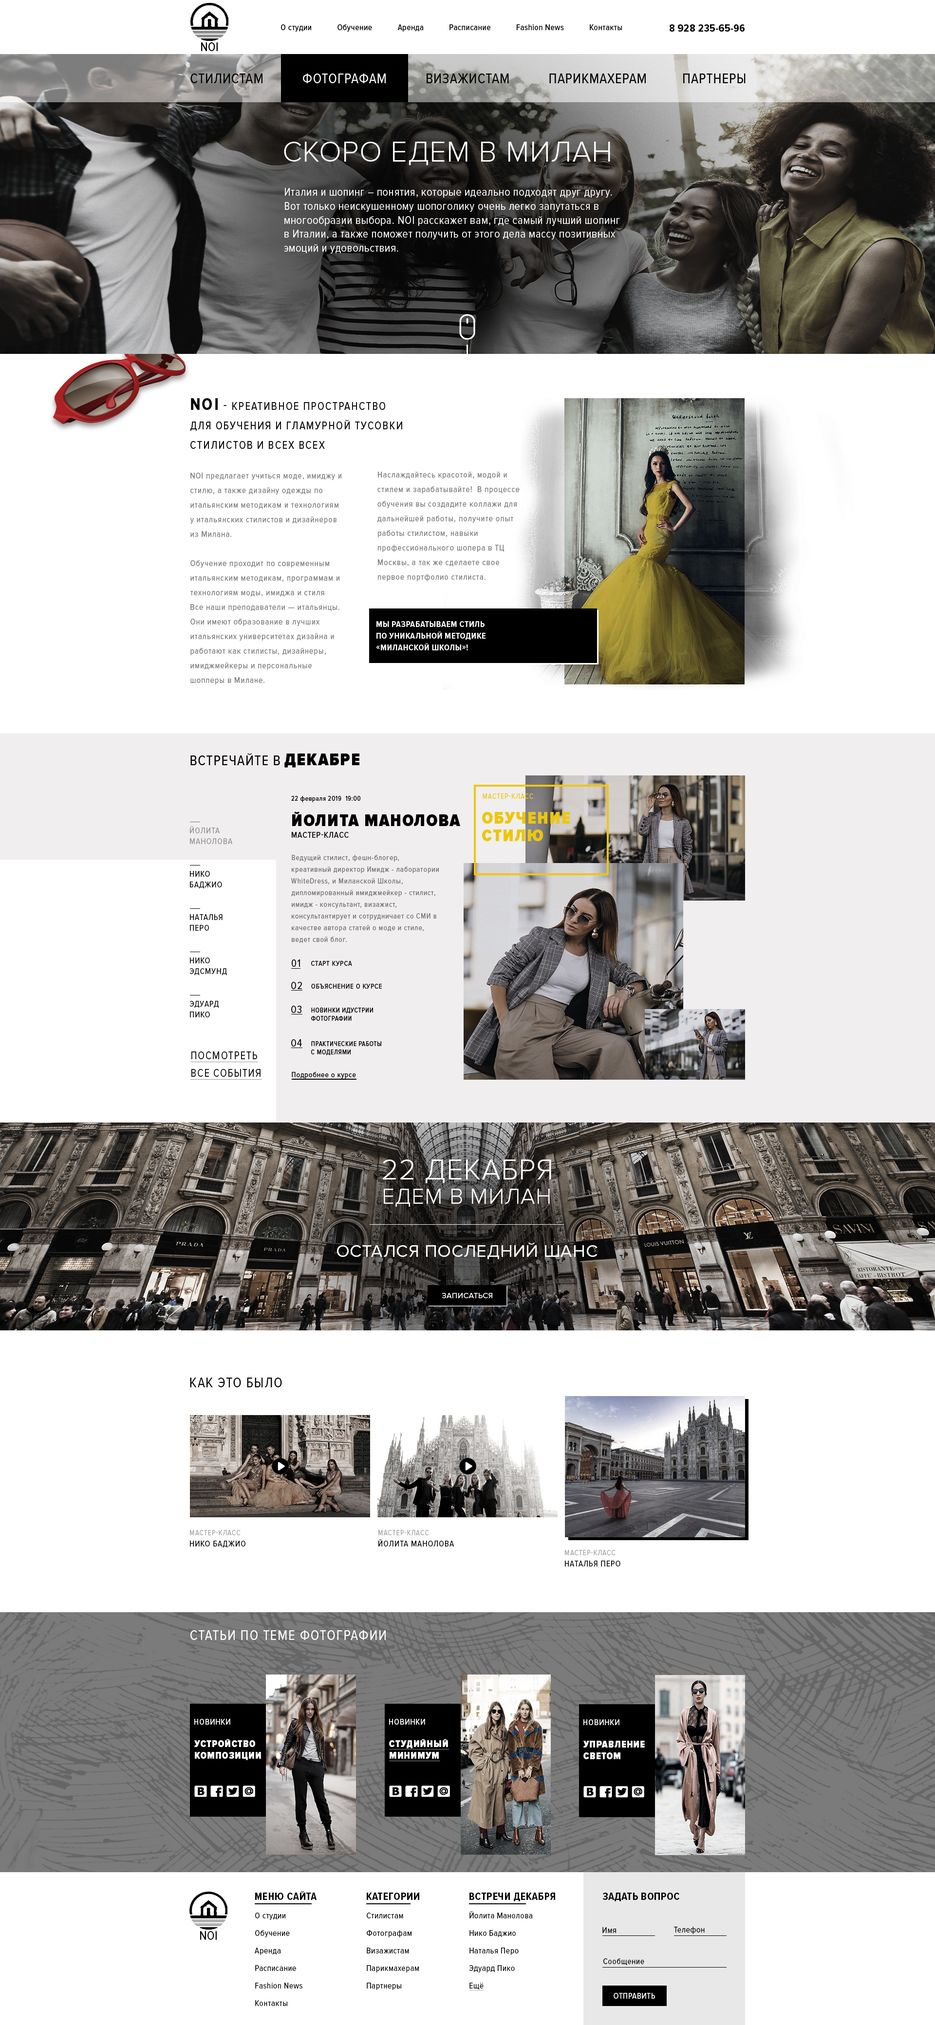 Дизайн сайта - Студия